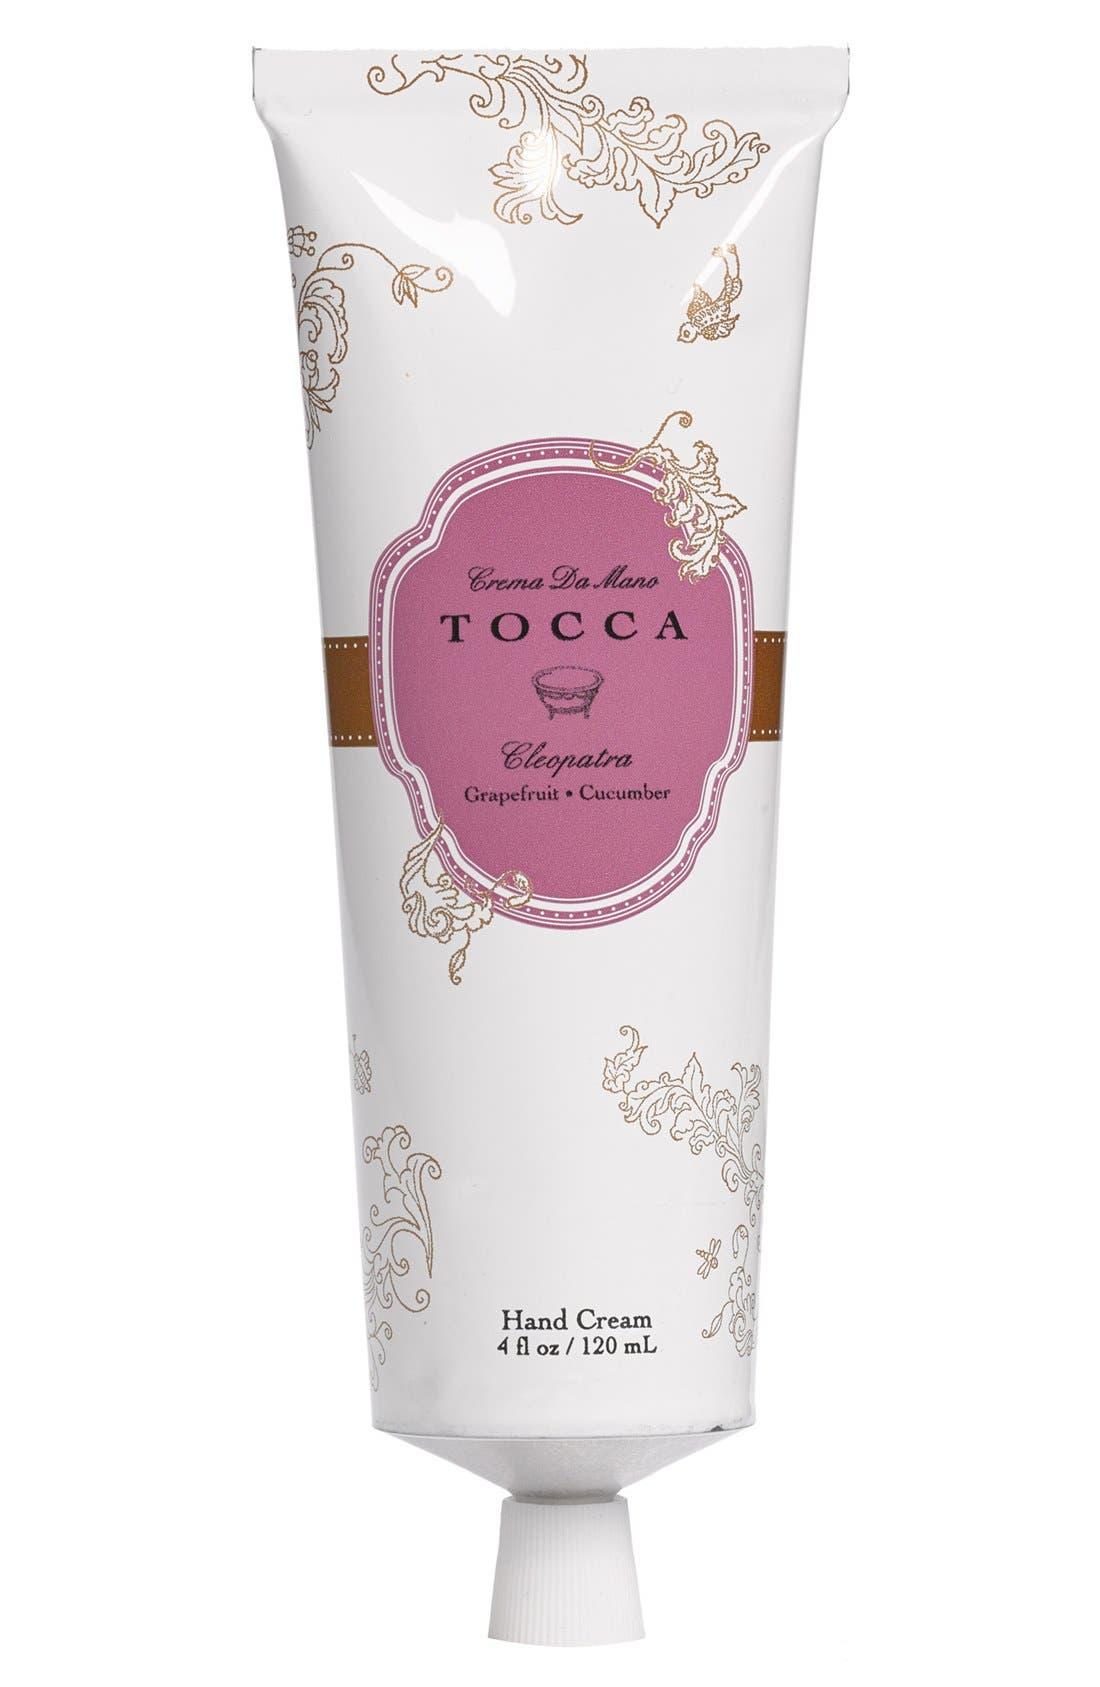 TOCCA 'Cleopatra' Hand Cream